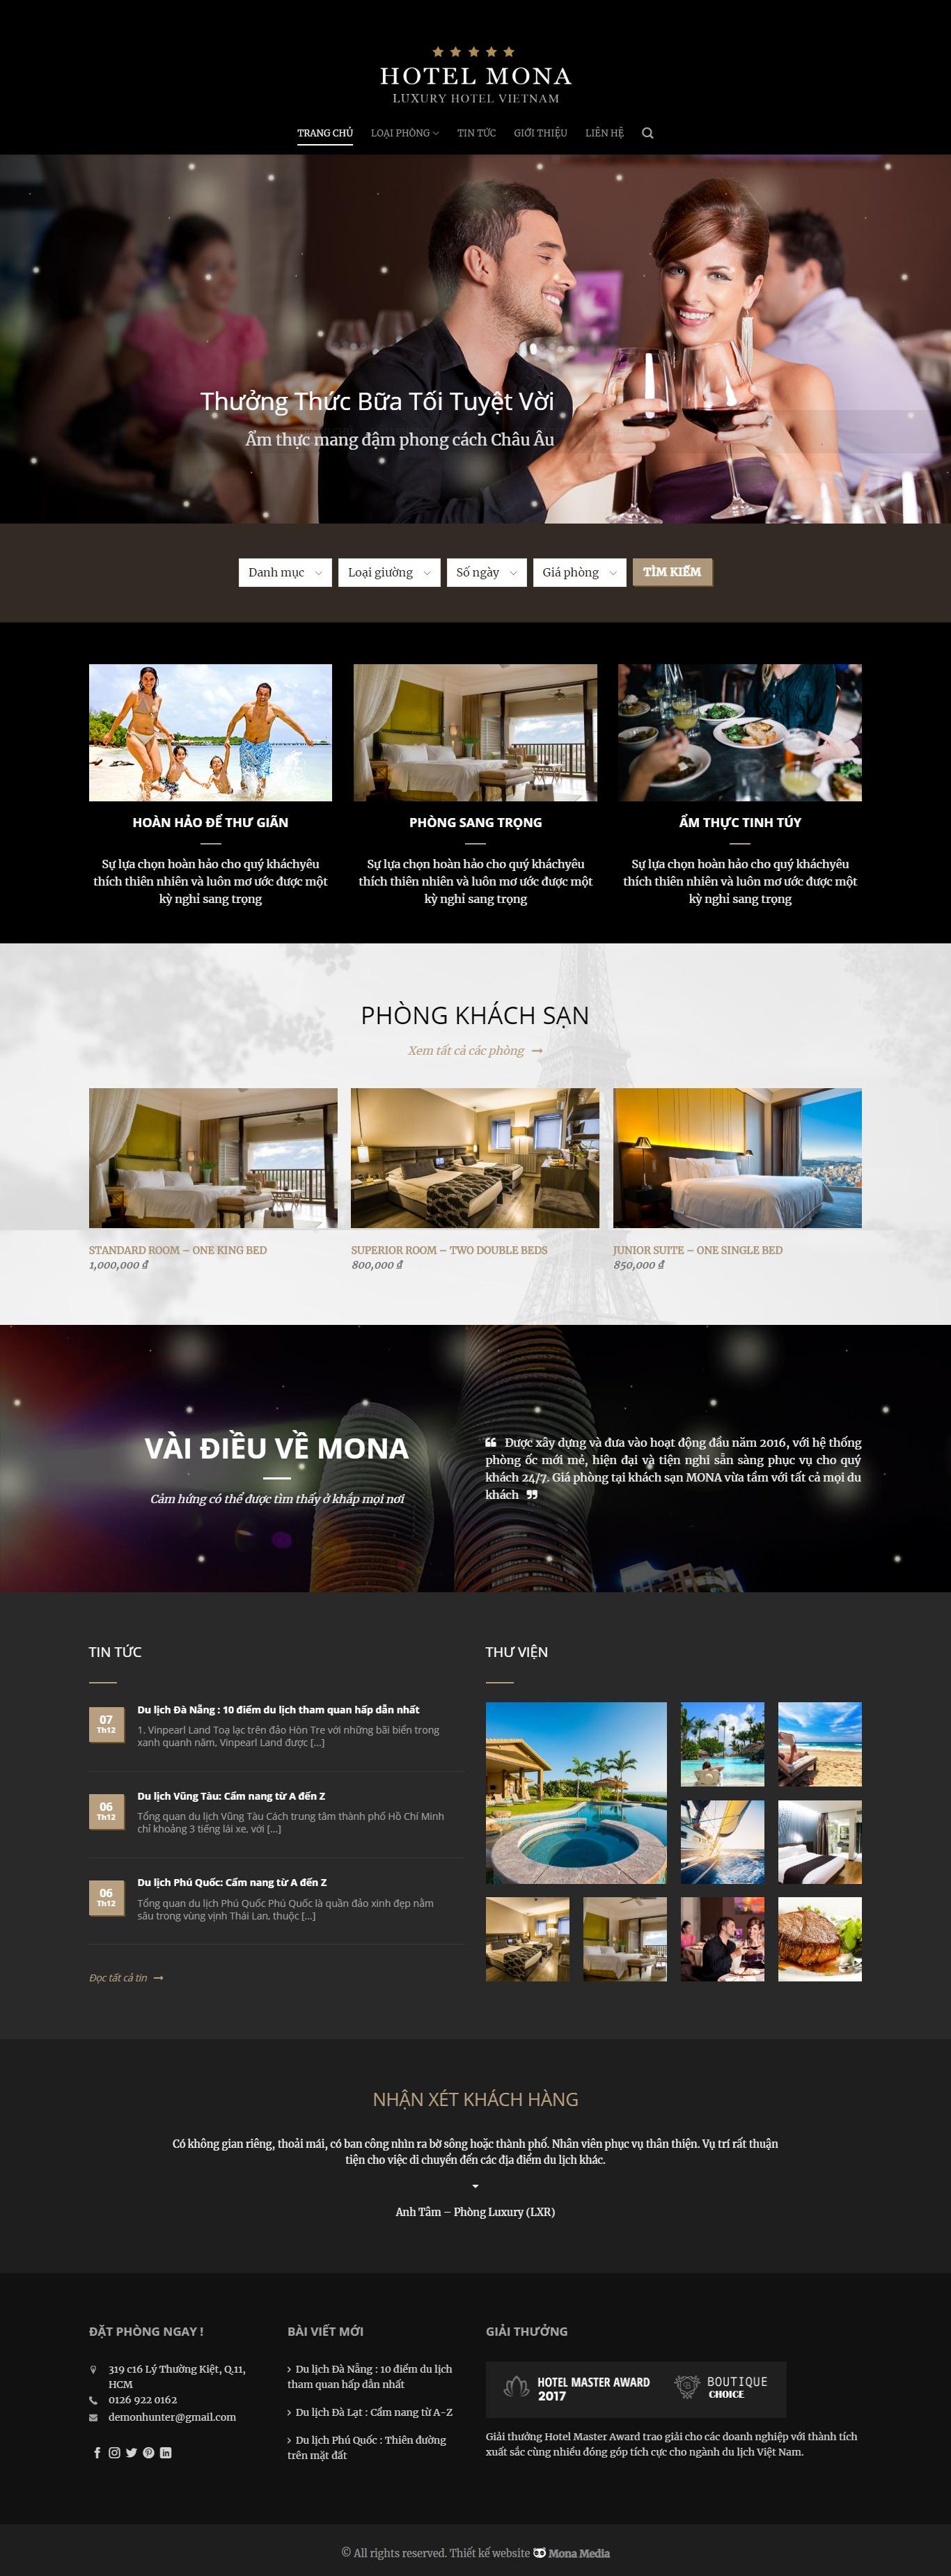 Mẫu website giới thiệu hotel giống HotelMaster